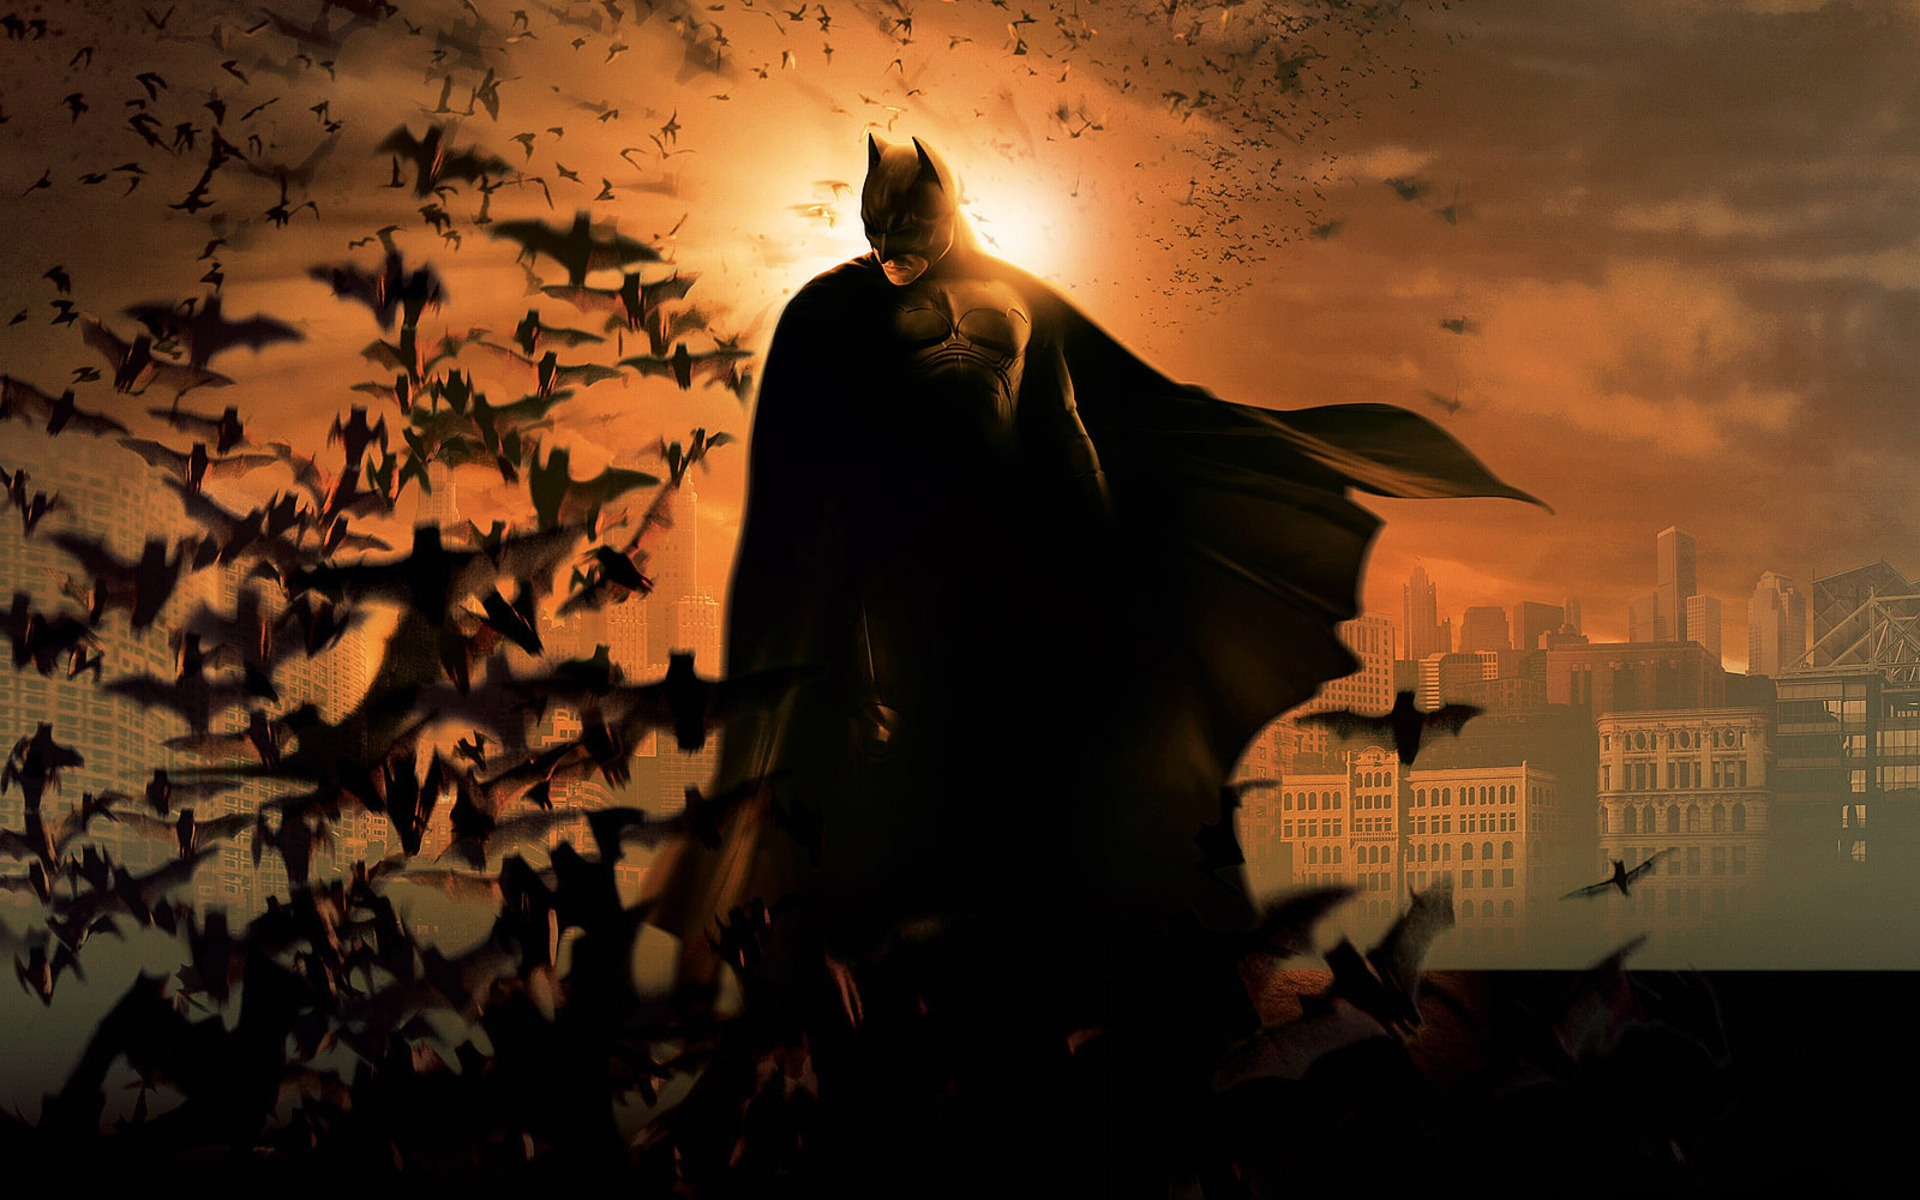 Free Download The Dark Knight Rises Wallpaper Batman Wallpaper